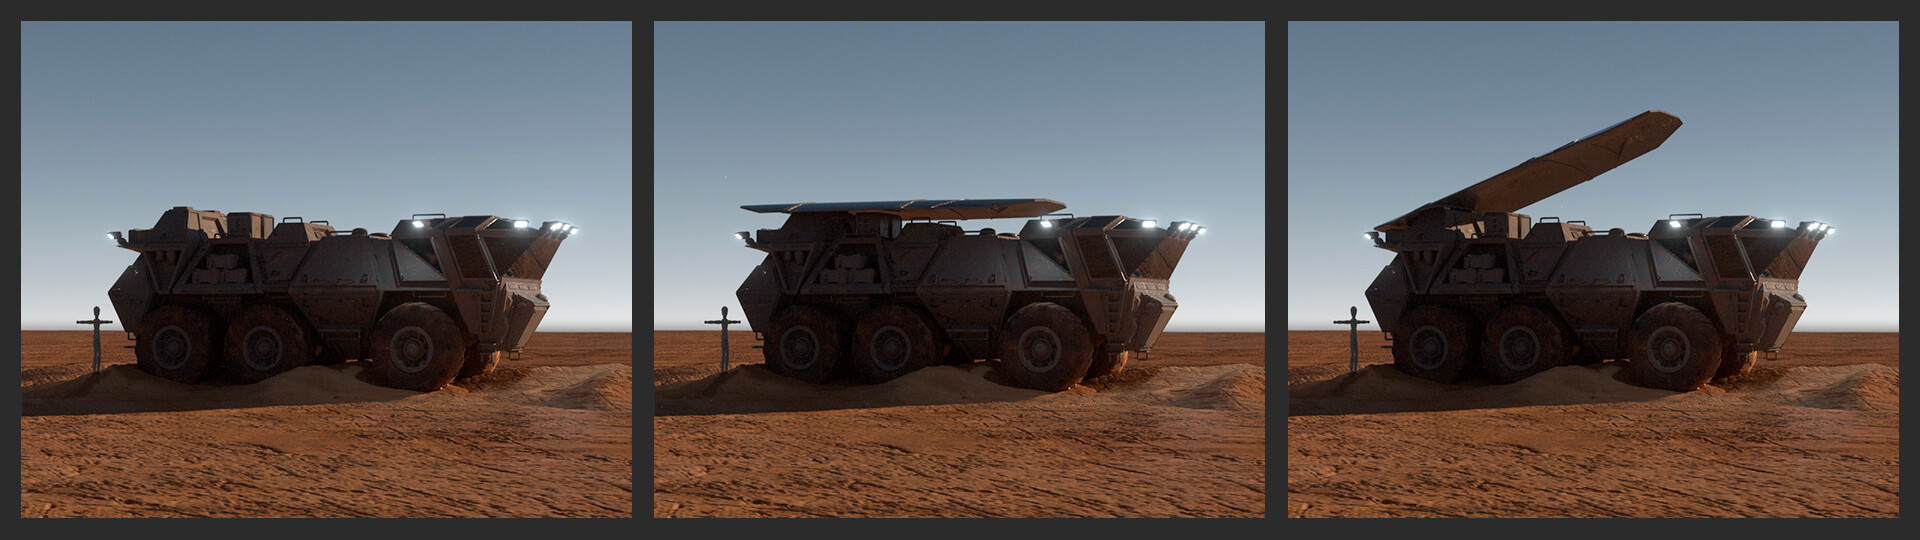 Wojtek kapusta conqueror mars vehicle solar